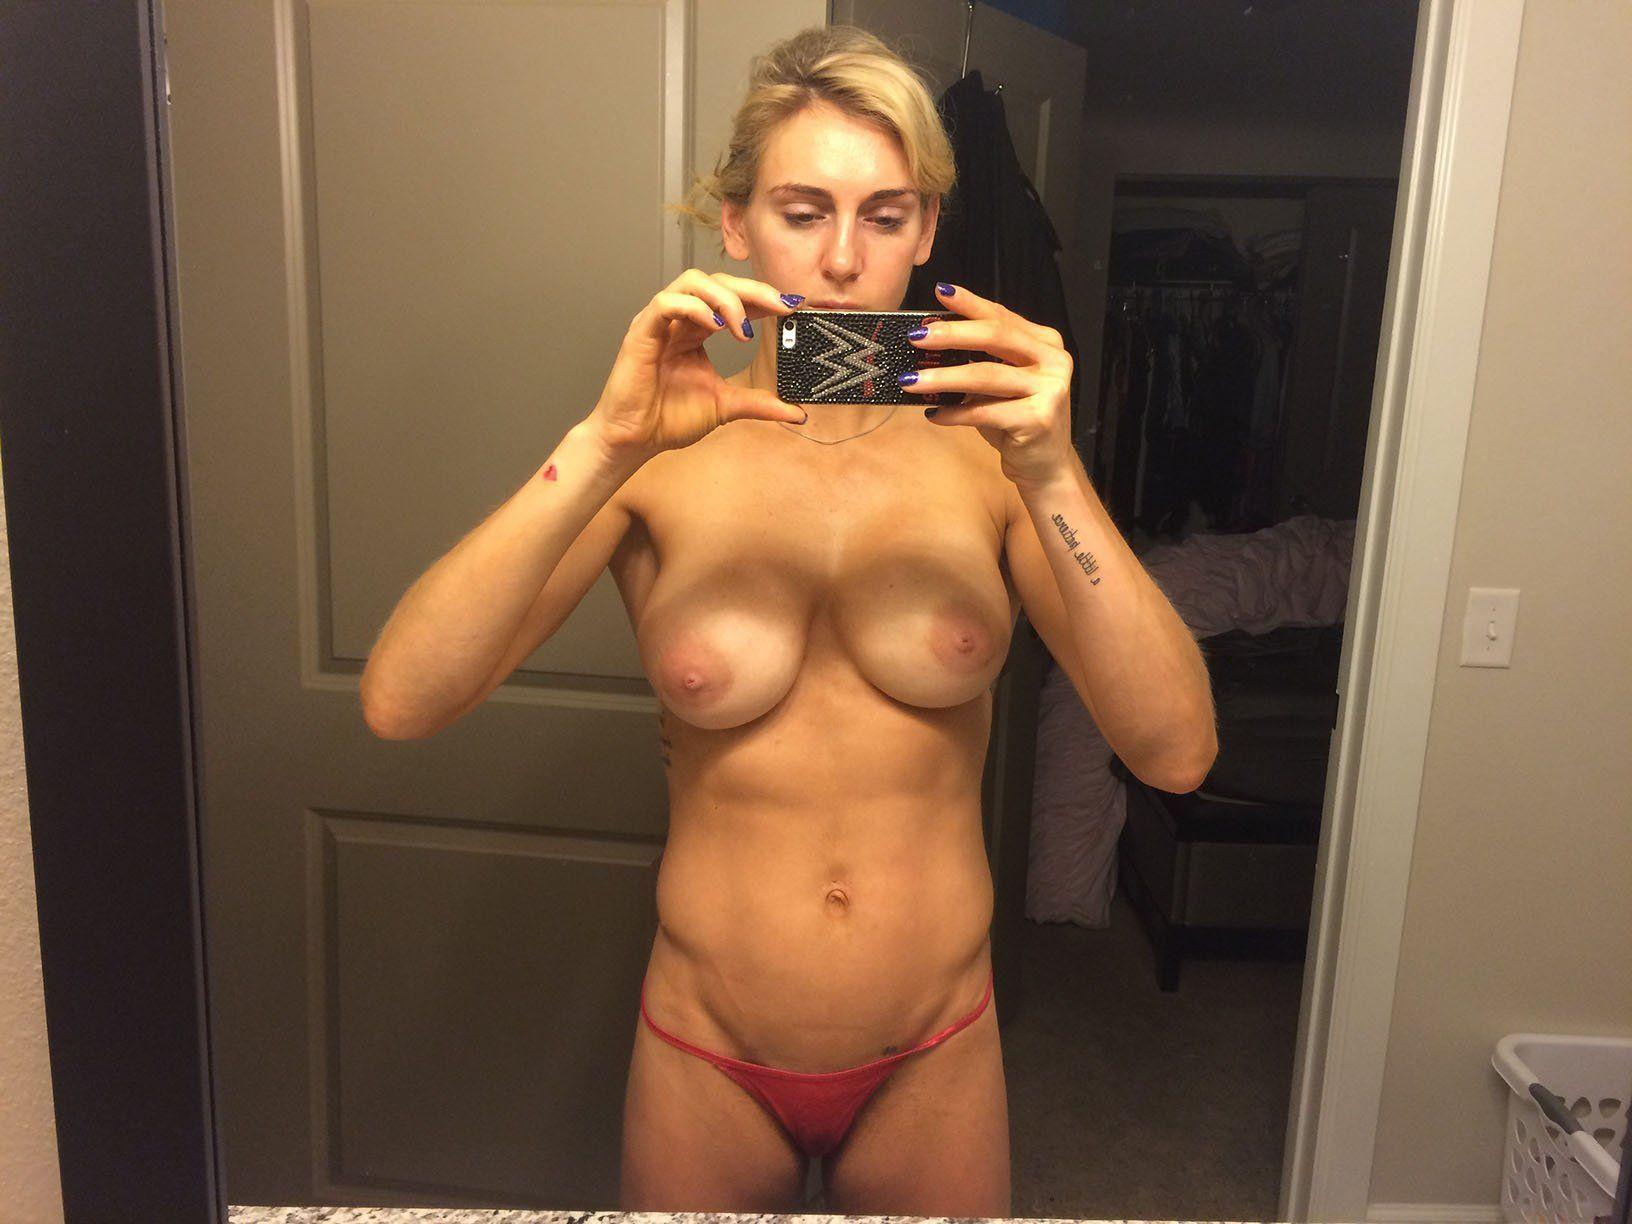 best of Wreselers the nude Wwe in girl